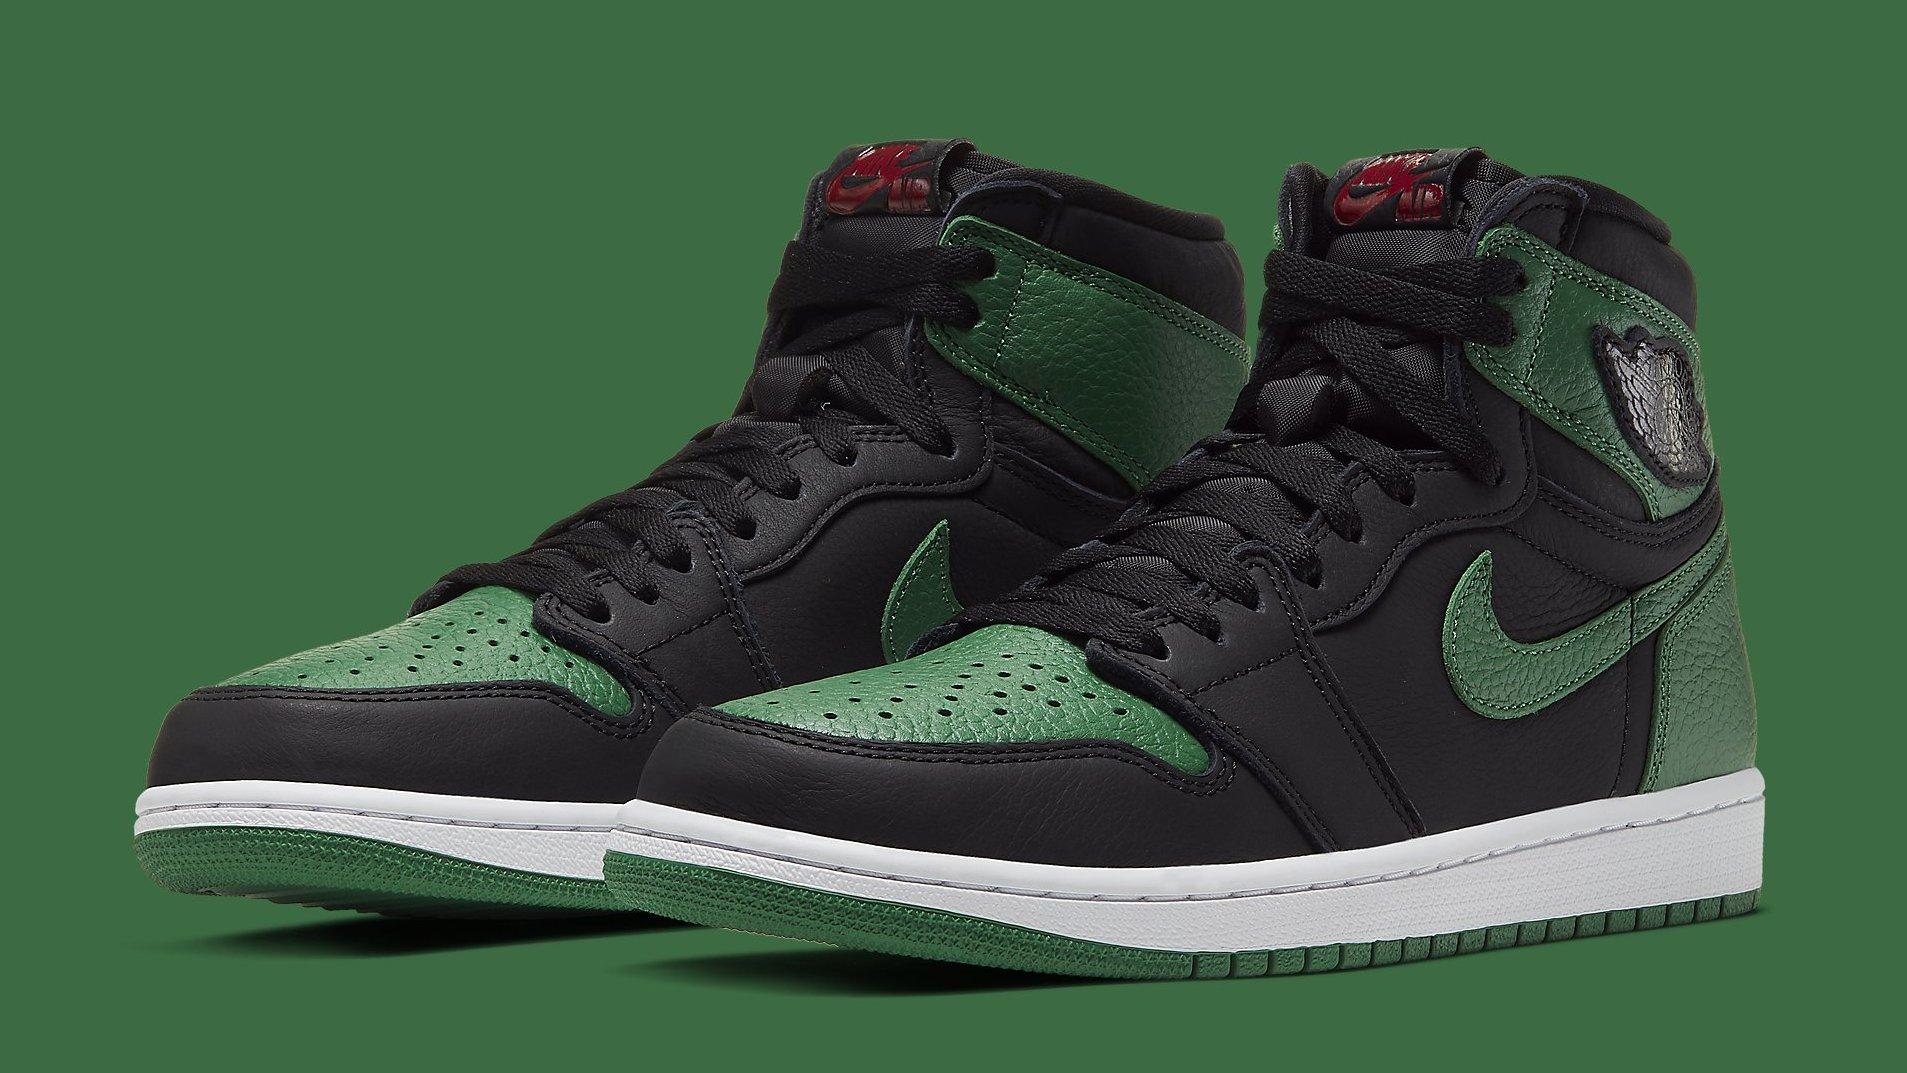 Air Jordan 1 Retro High OG 'Pine Green' Release Date 555088-030 ...